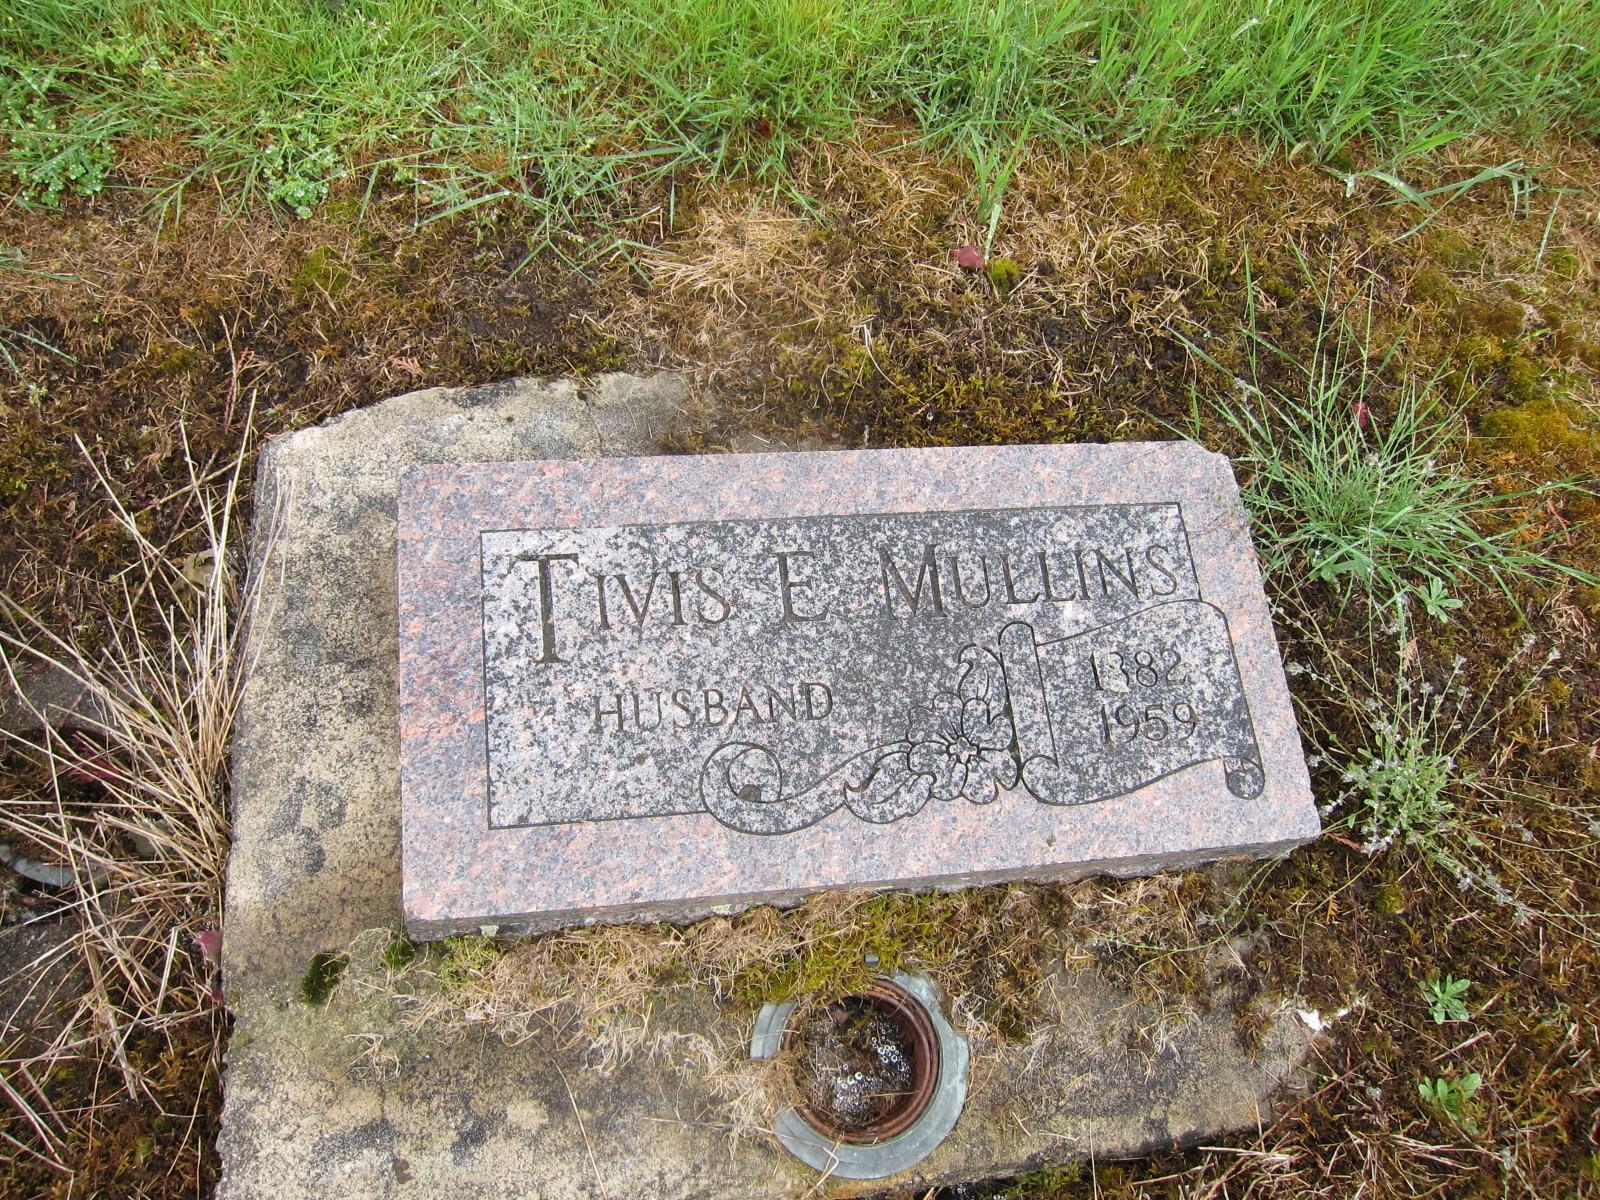 Tivis E Mullins